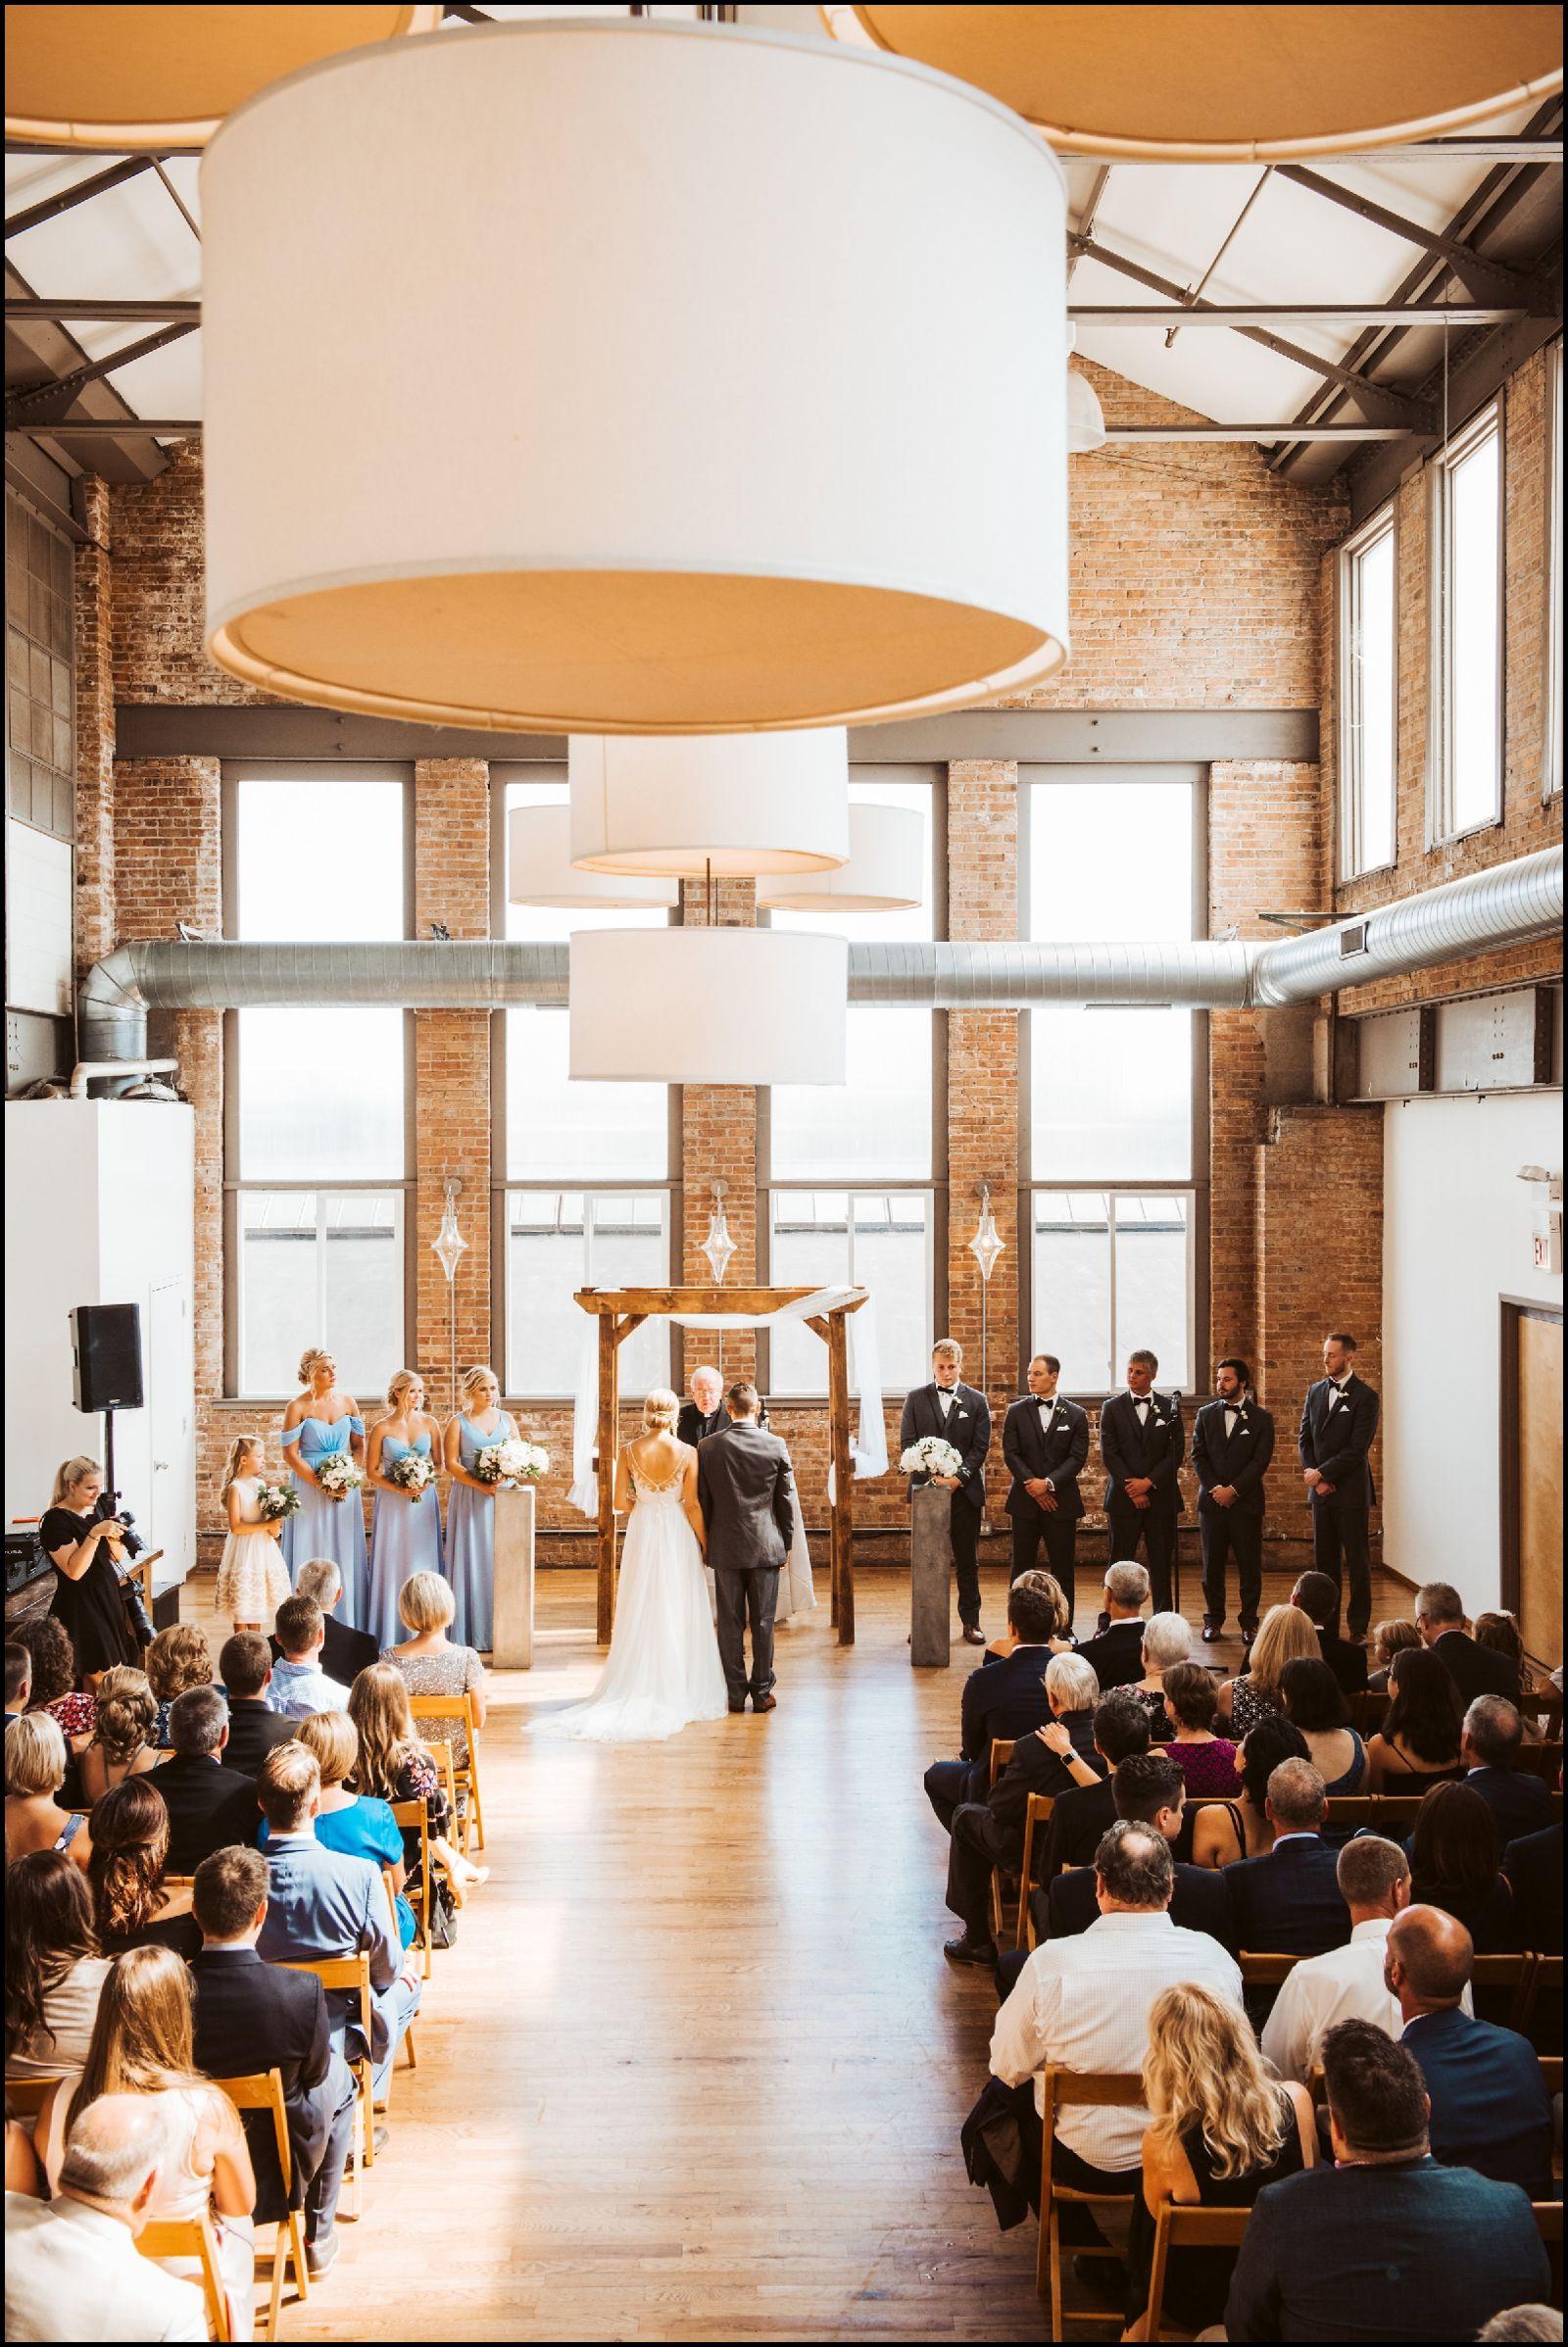 Chicago Wedding Planner Chicago Wedding Industrial Wedding Ceremony Wedding Locations